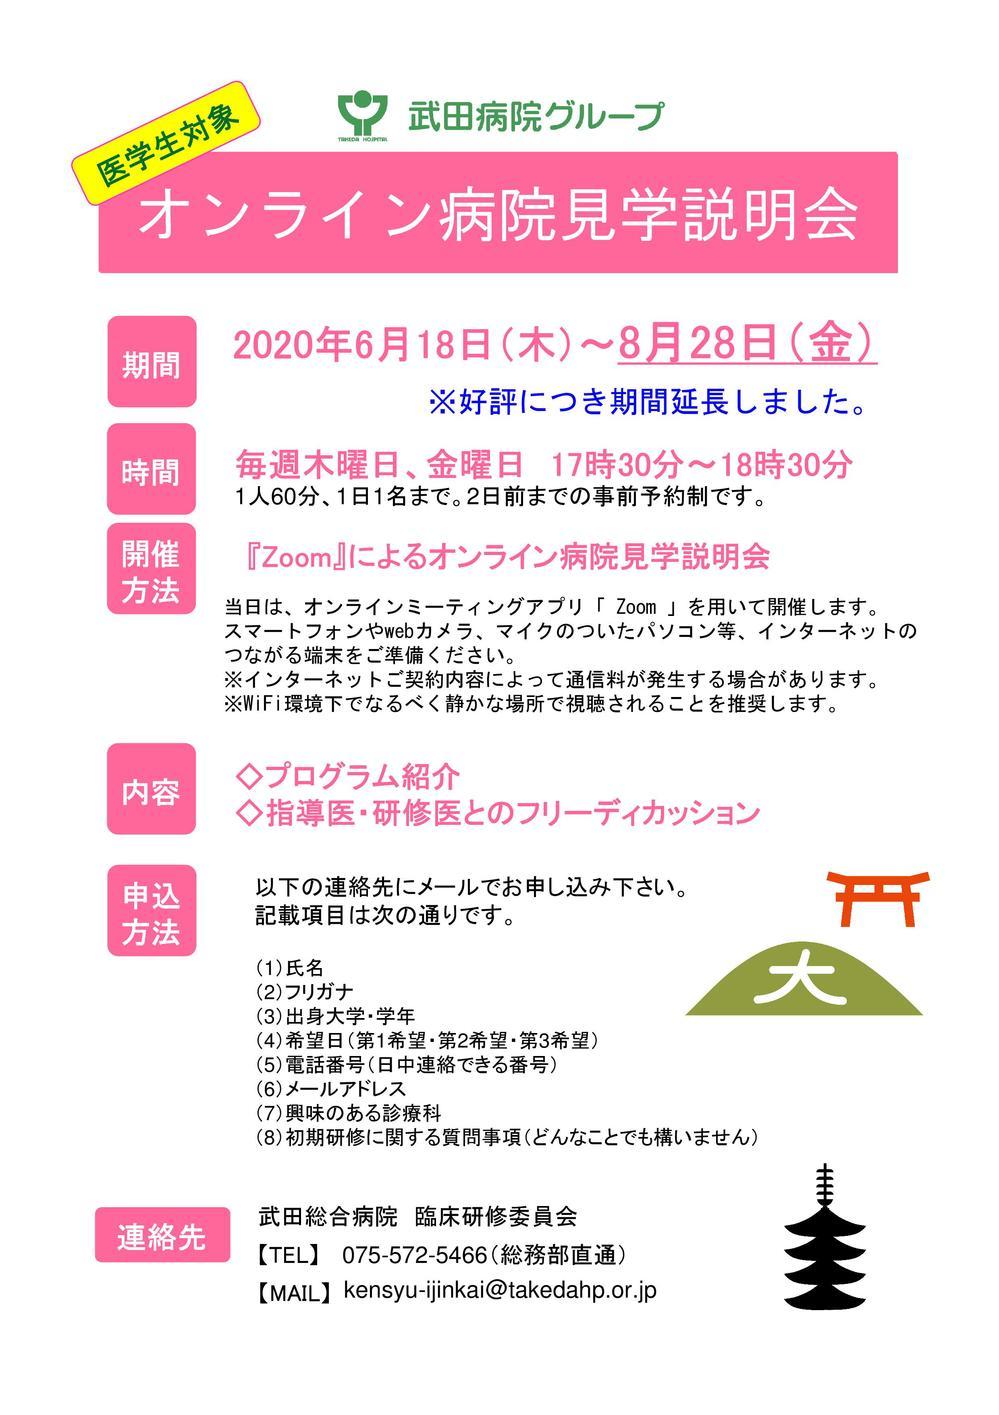 Microsoft PowerPoint - WEB説明会_202006月_京都ver_HP_200703_期間延長.jpg